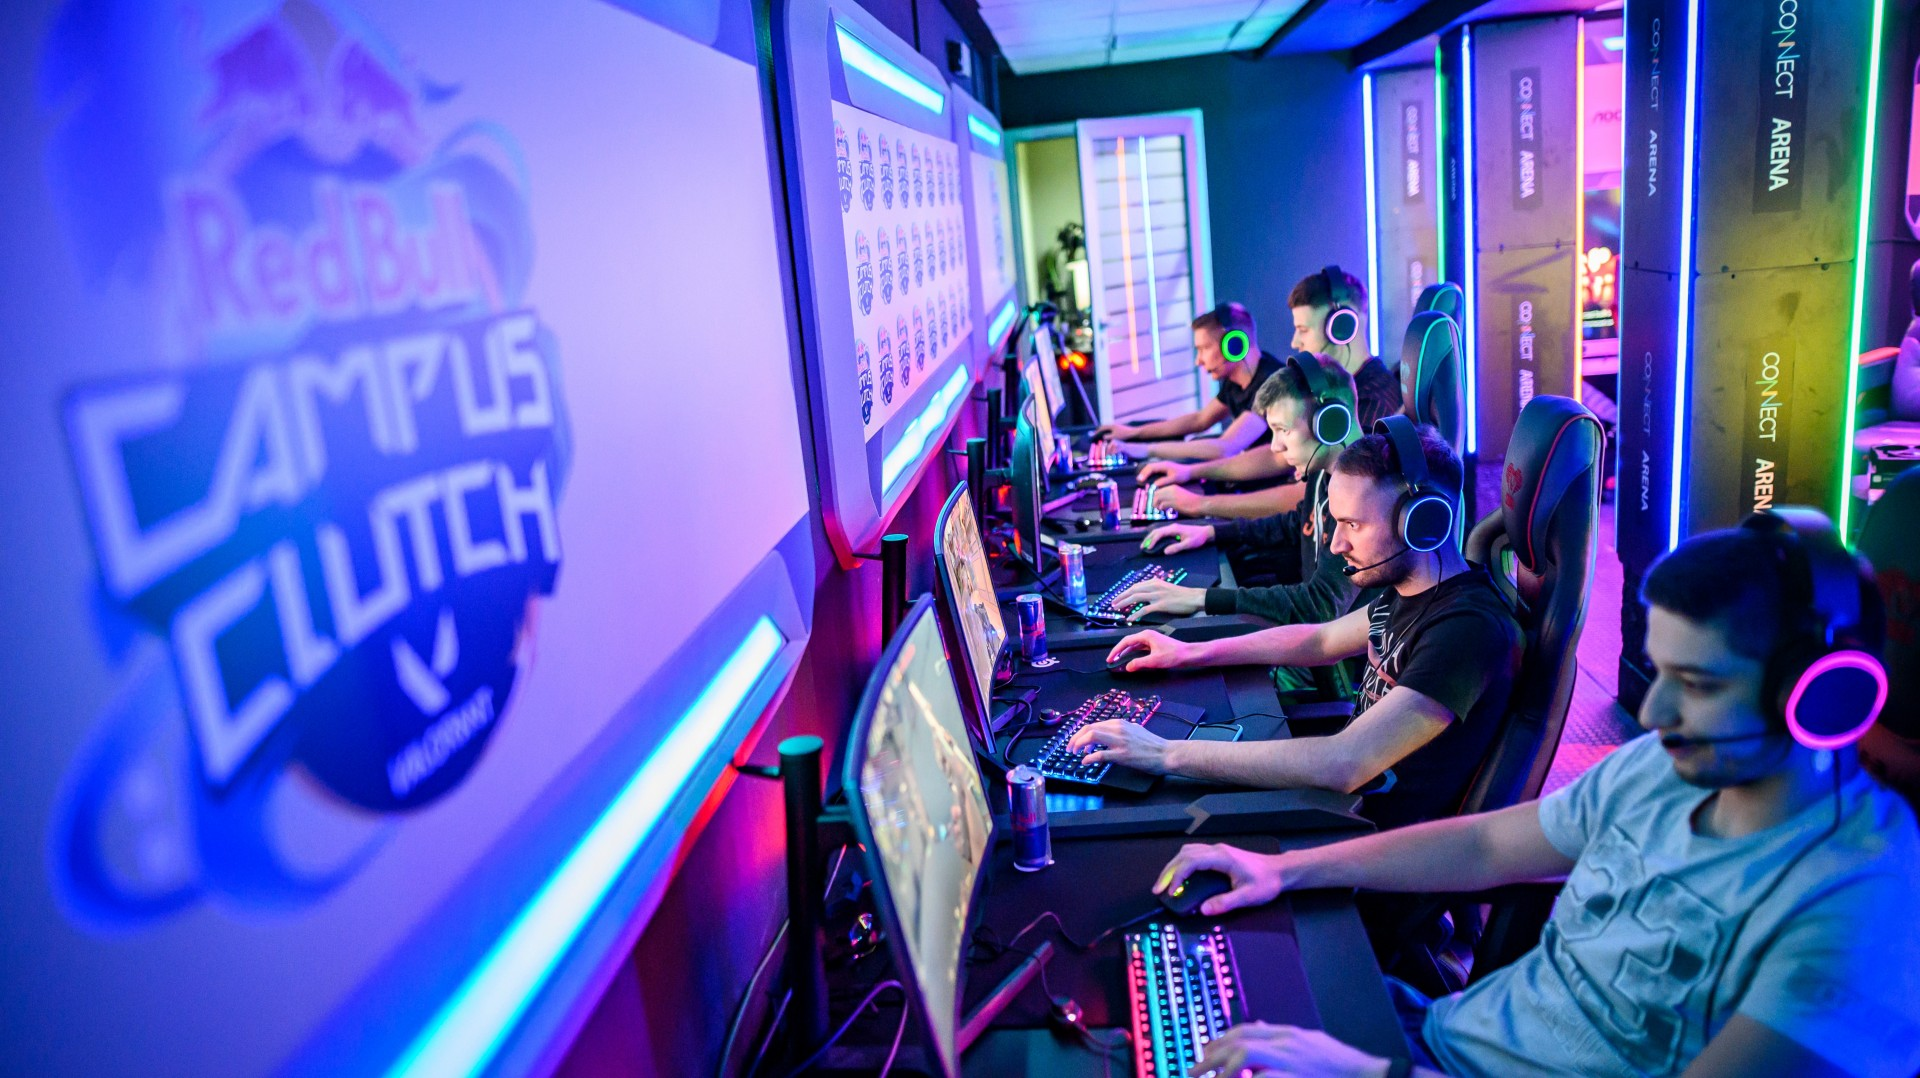 Команда из Беларуси сыграет в финале Red Bull Campus Clutch по VALORANT